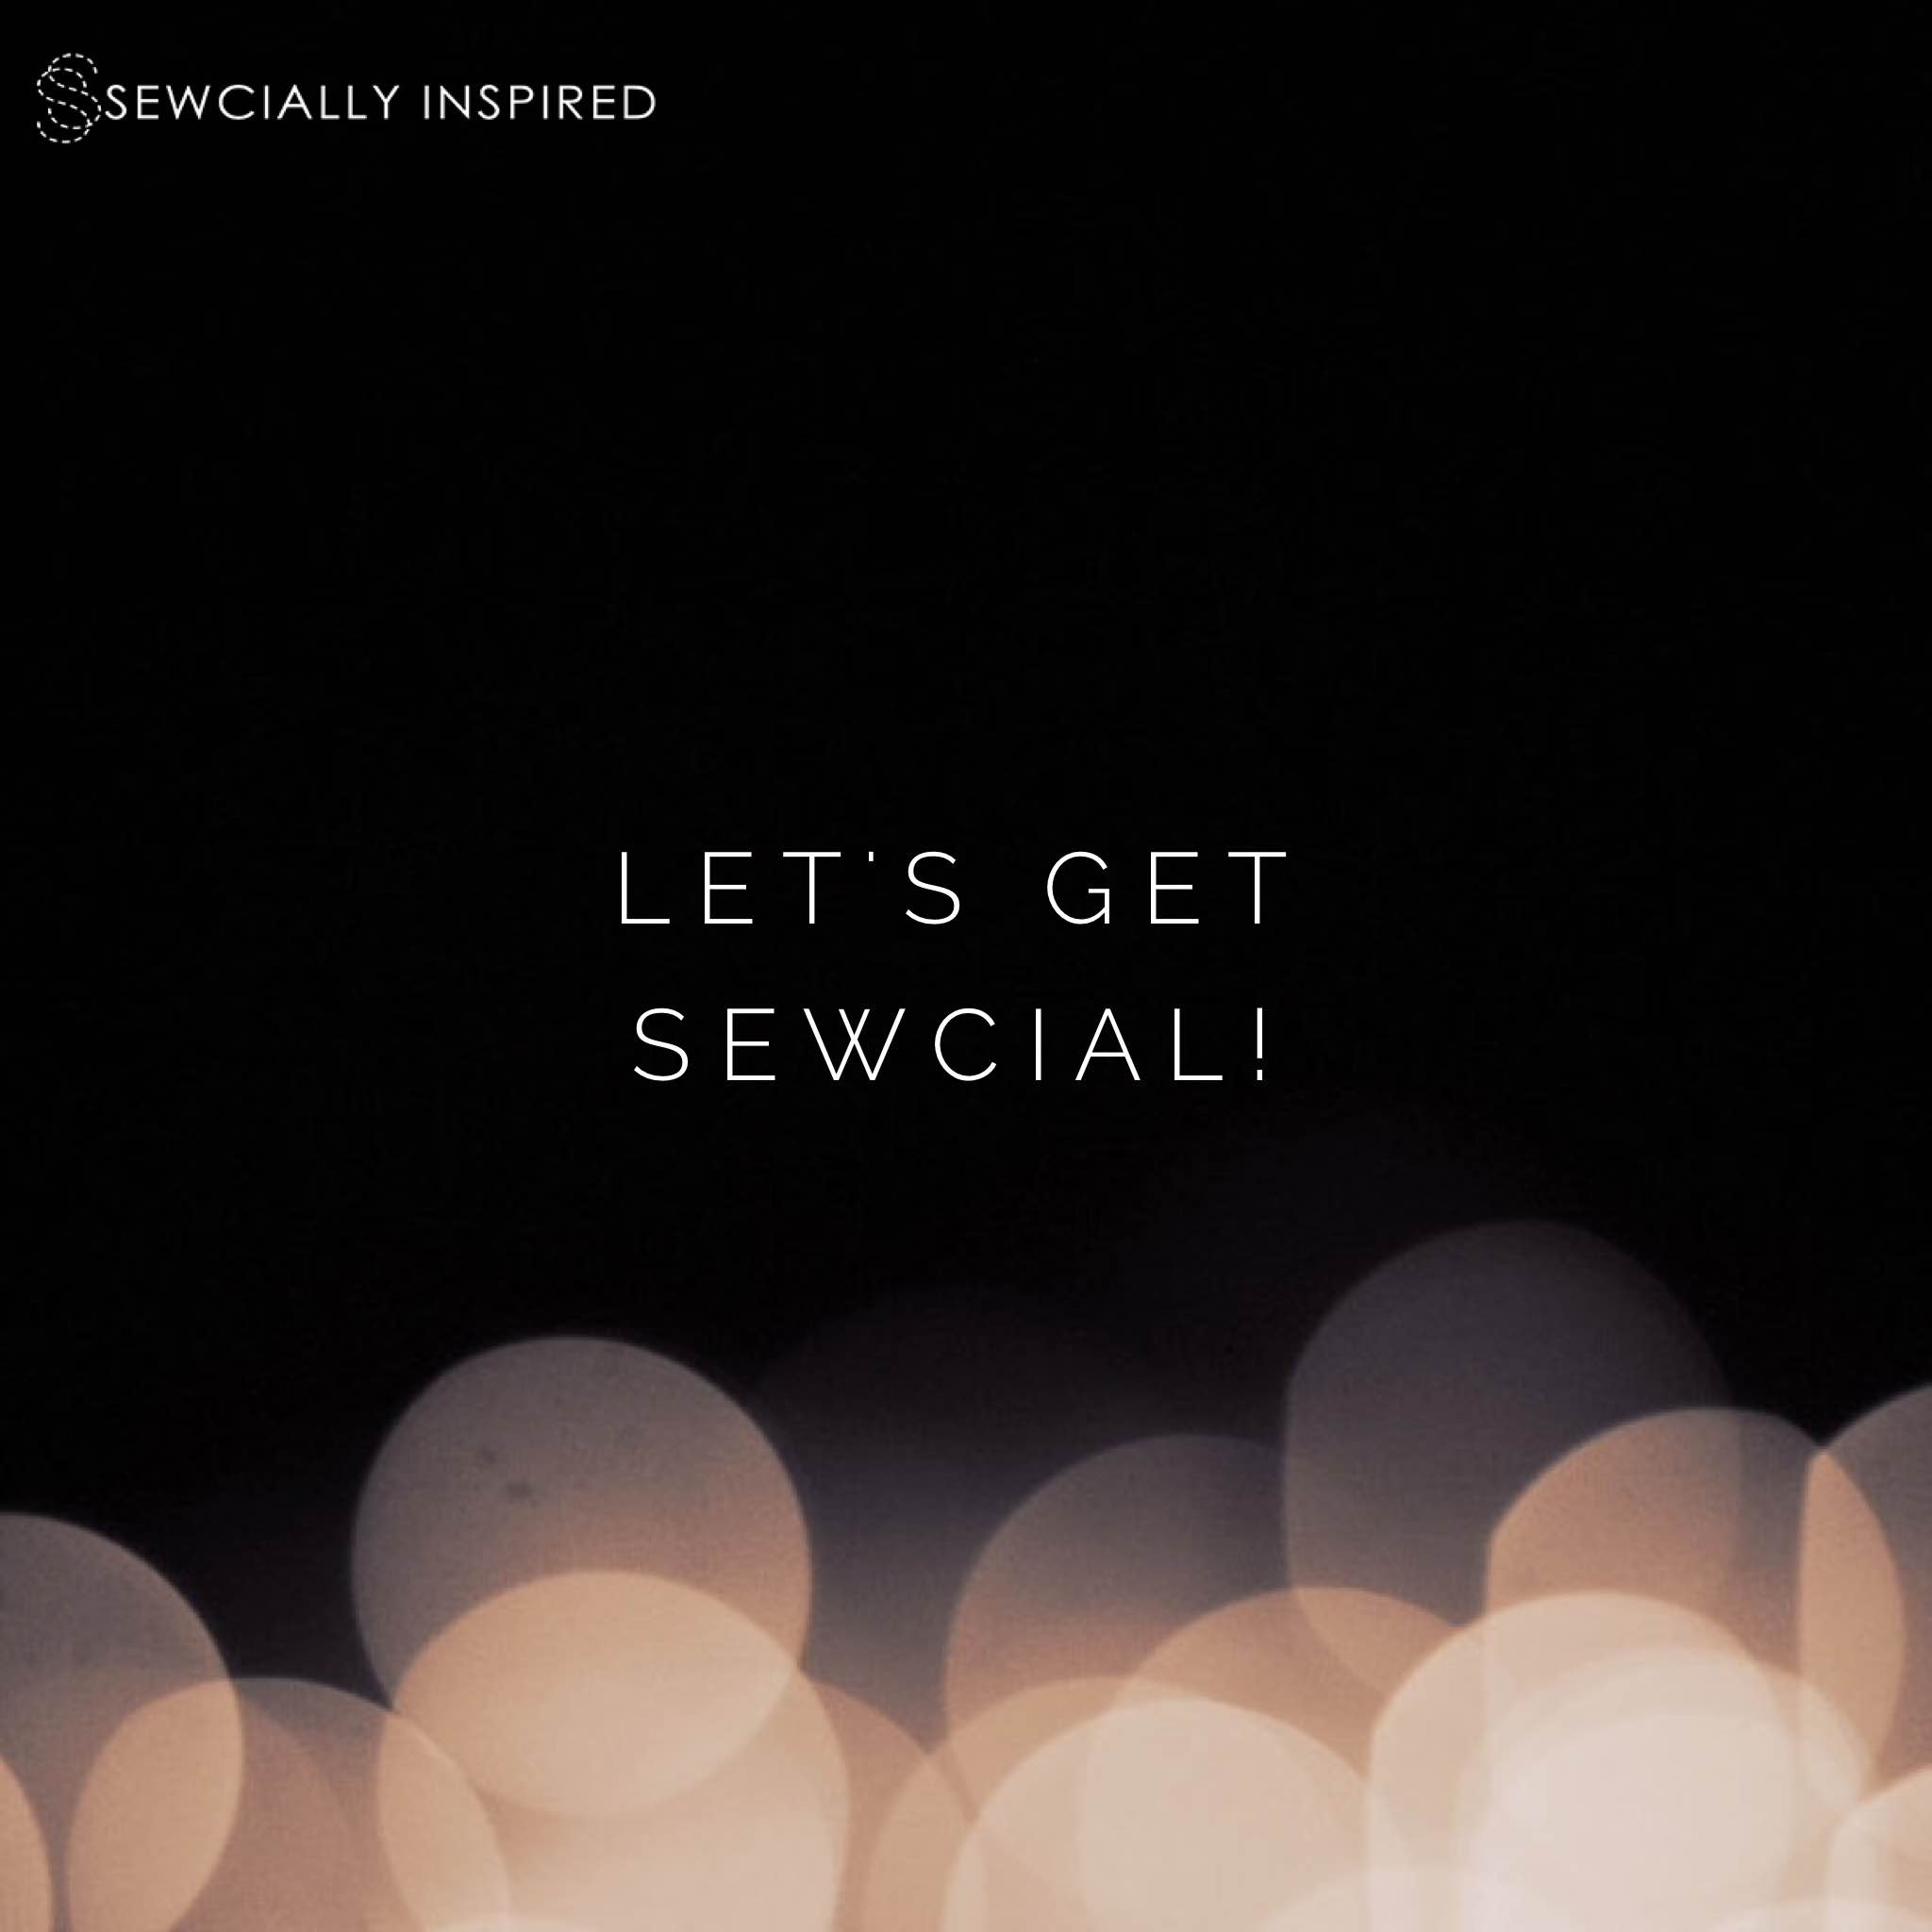 lets get sewcial.jpg